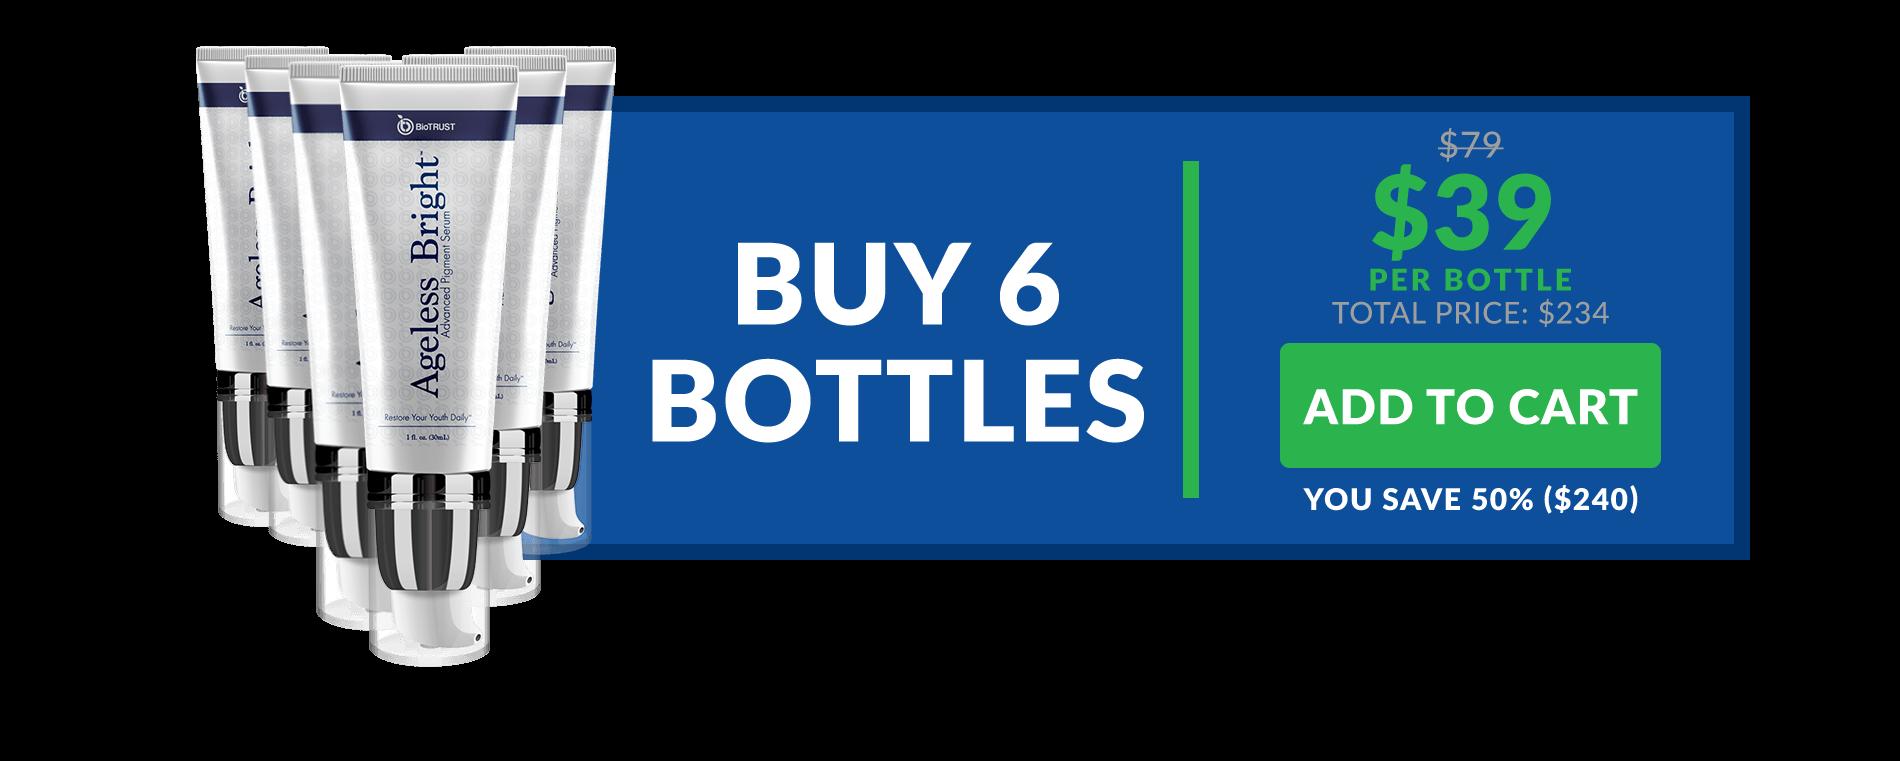 Ageless Bright - Buy 6